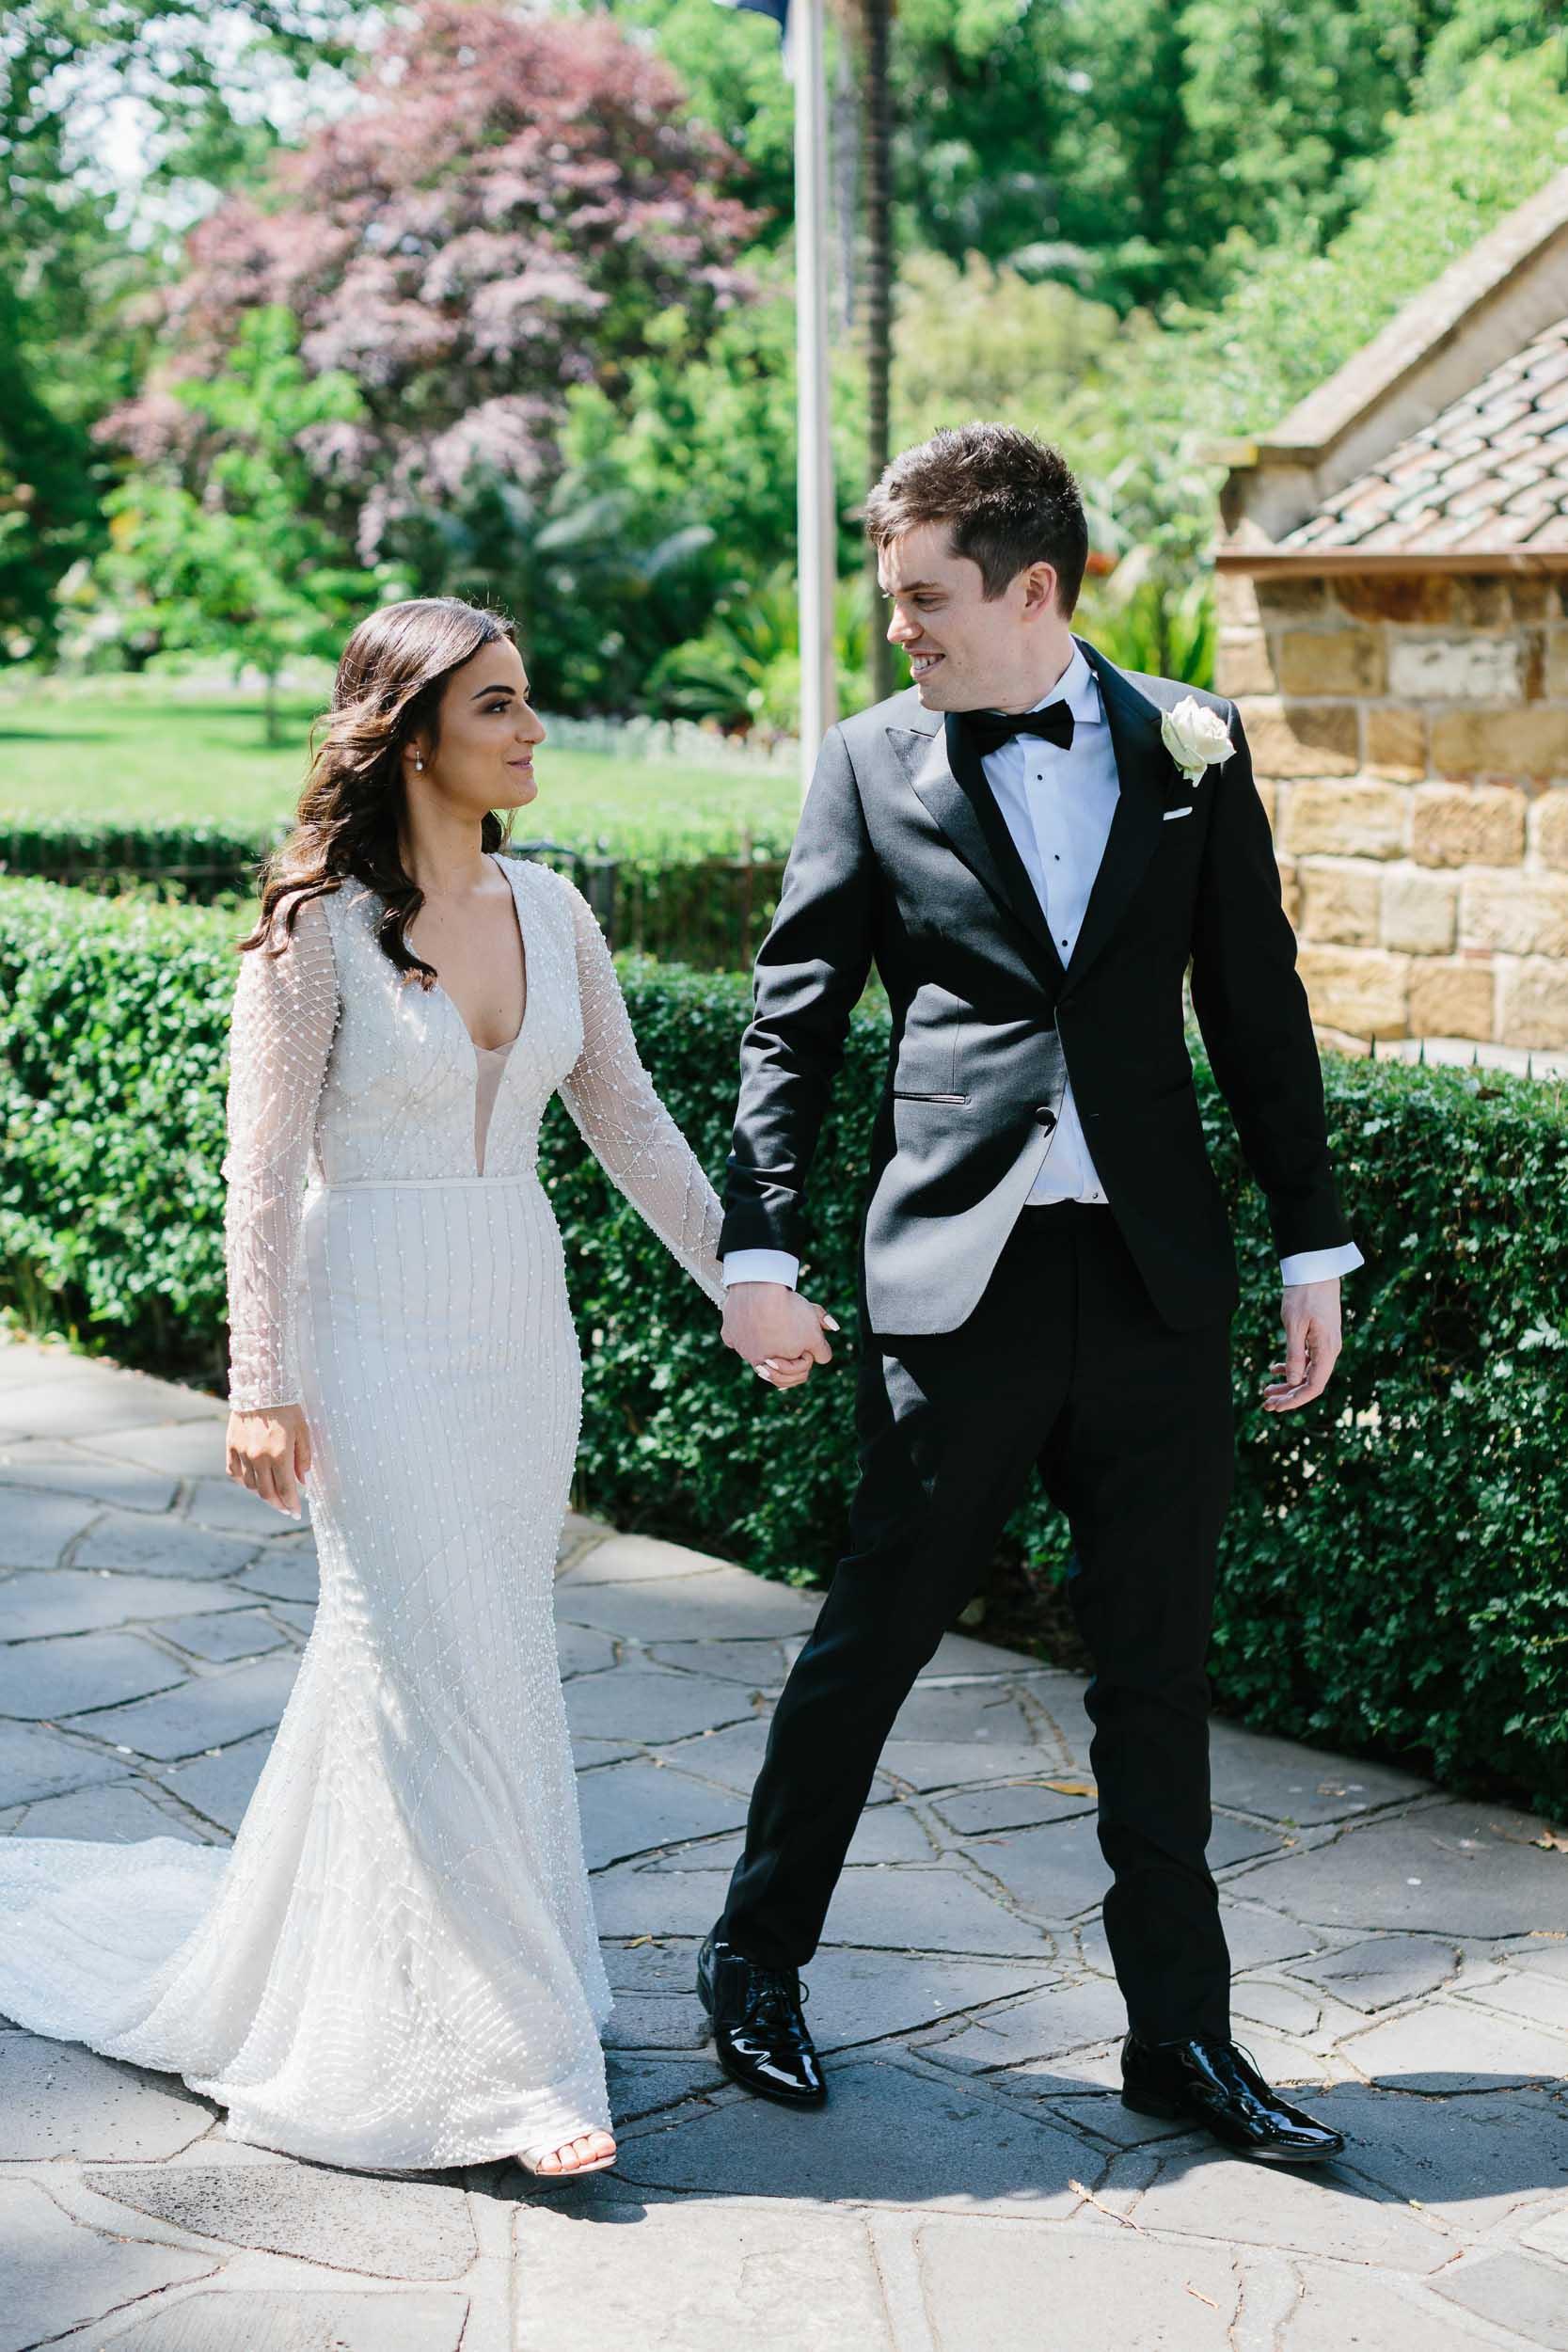 Kas-Richards-Wedding-Photographer-Melbourne-City-Wedding-Alto-Event-Space-Jane-Hill-Bridal-Gown-10.jpg